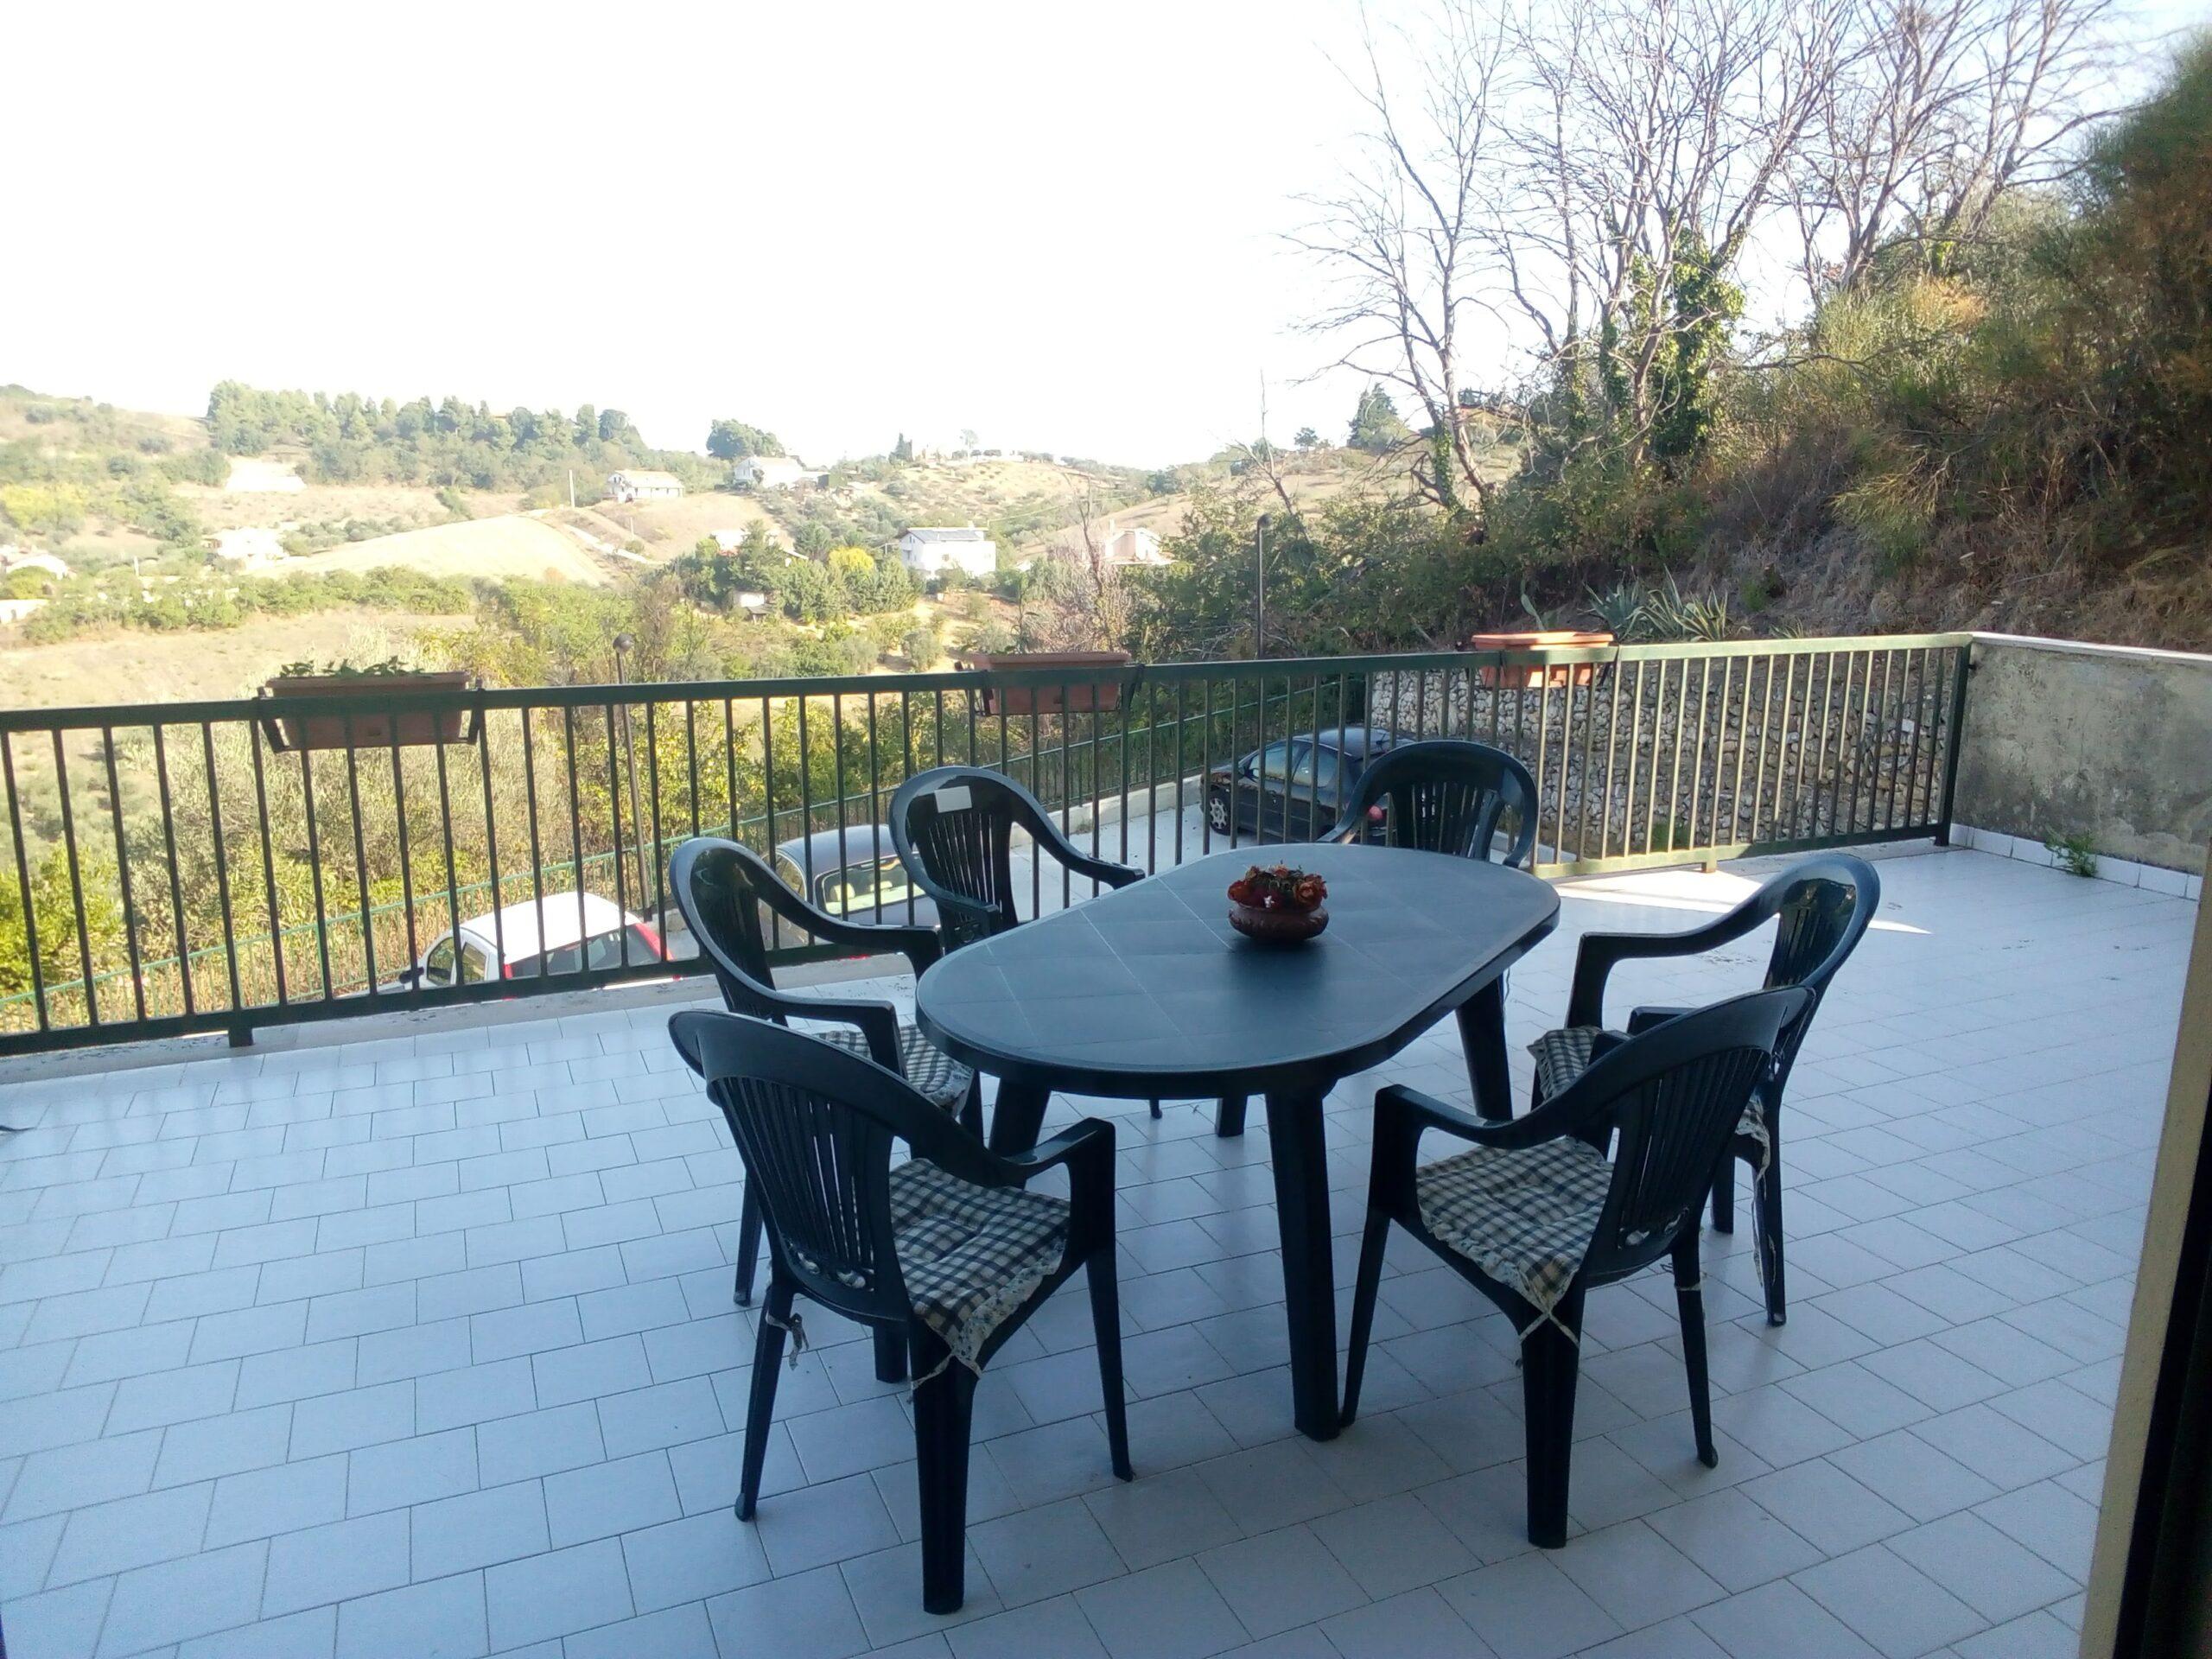 klp266 Appartamento con giardino privato e garage